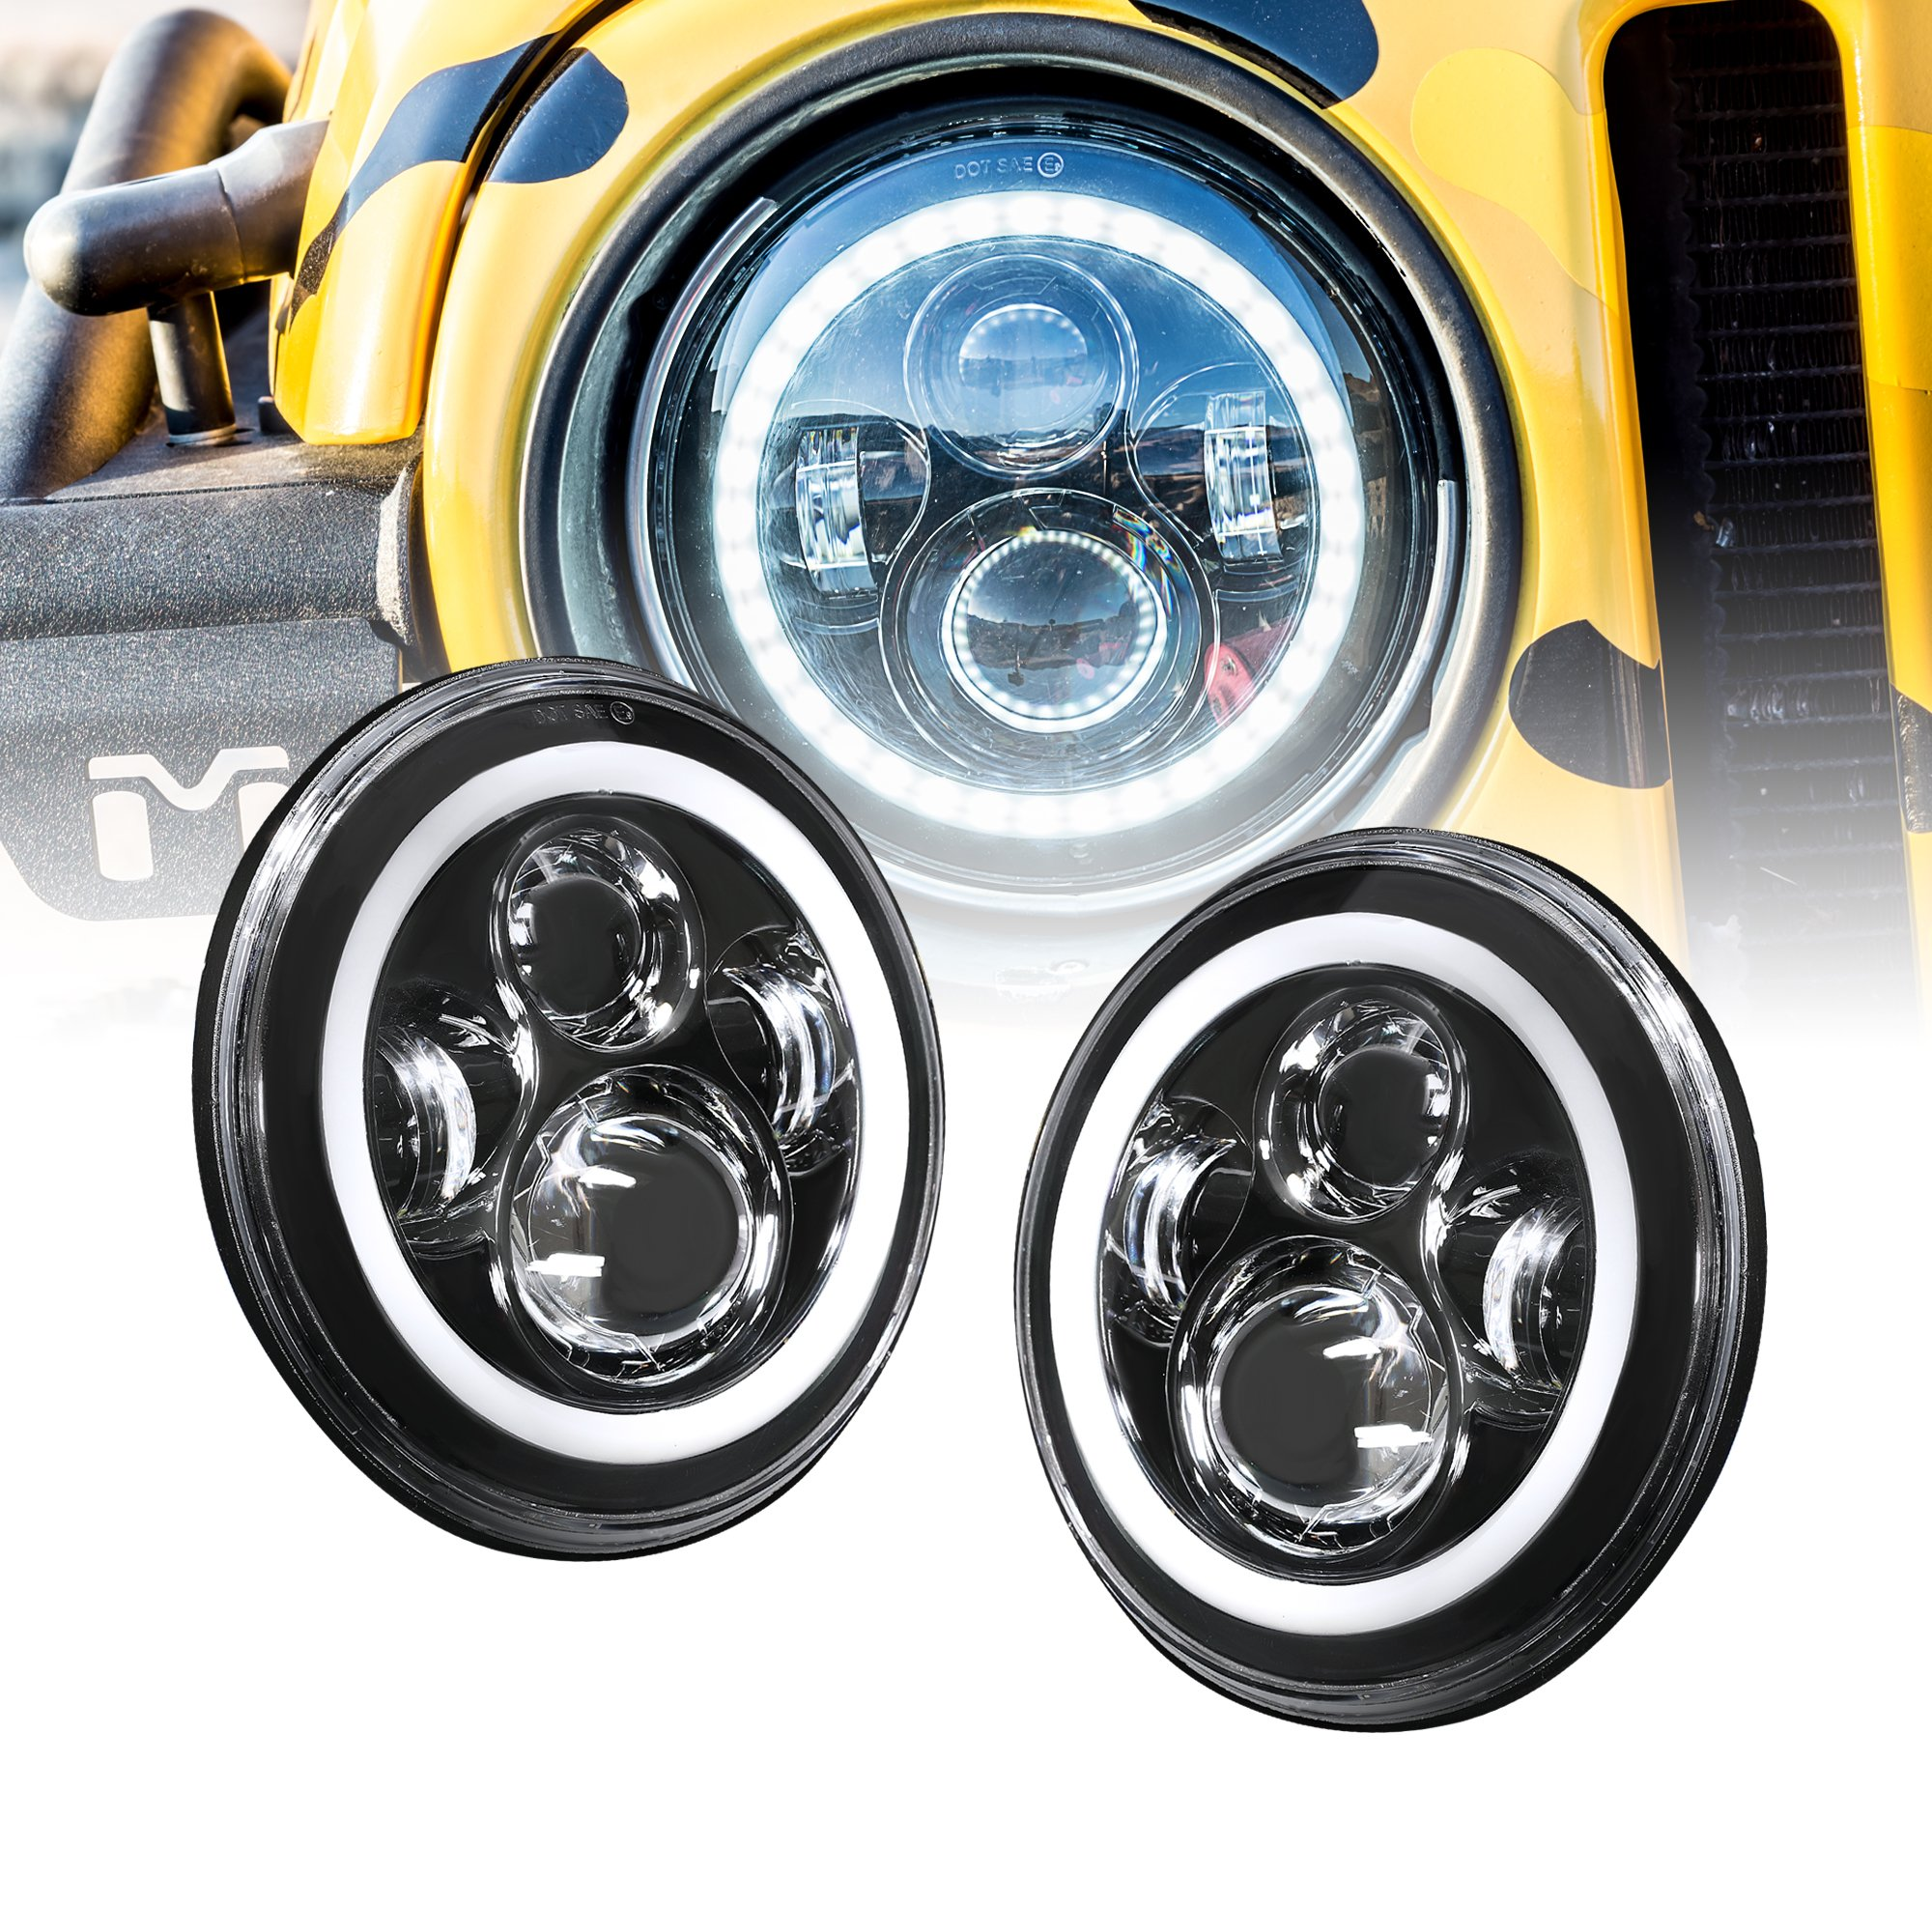 hight resolution of ols universal 7 round h4 45w led headlight sealed beam 2 pc set plug